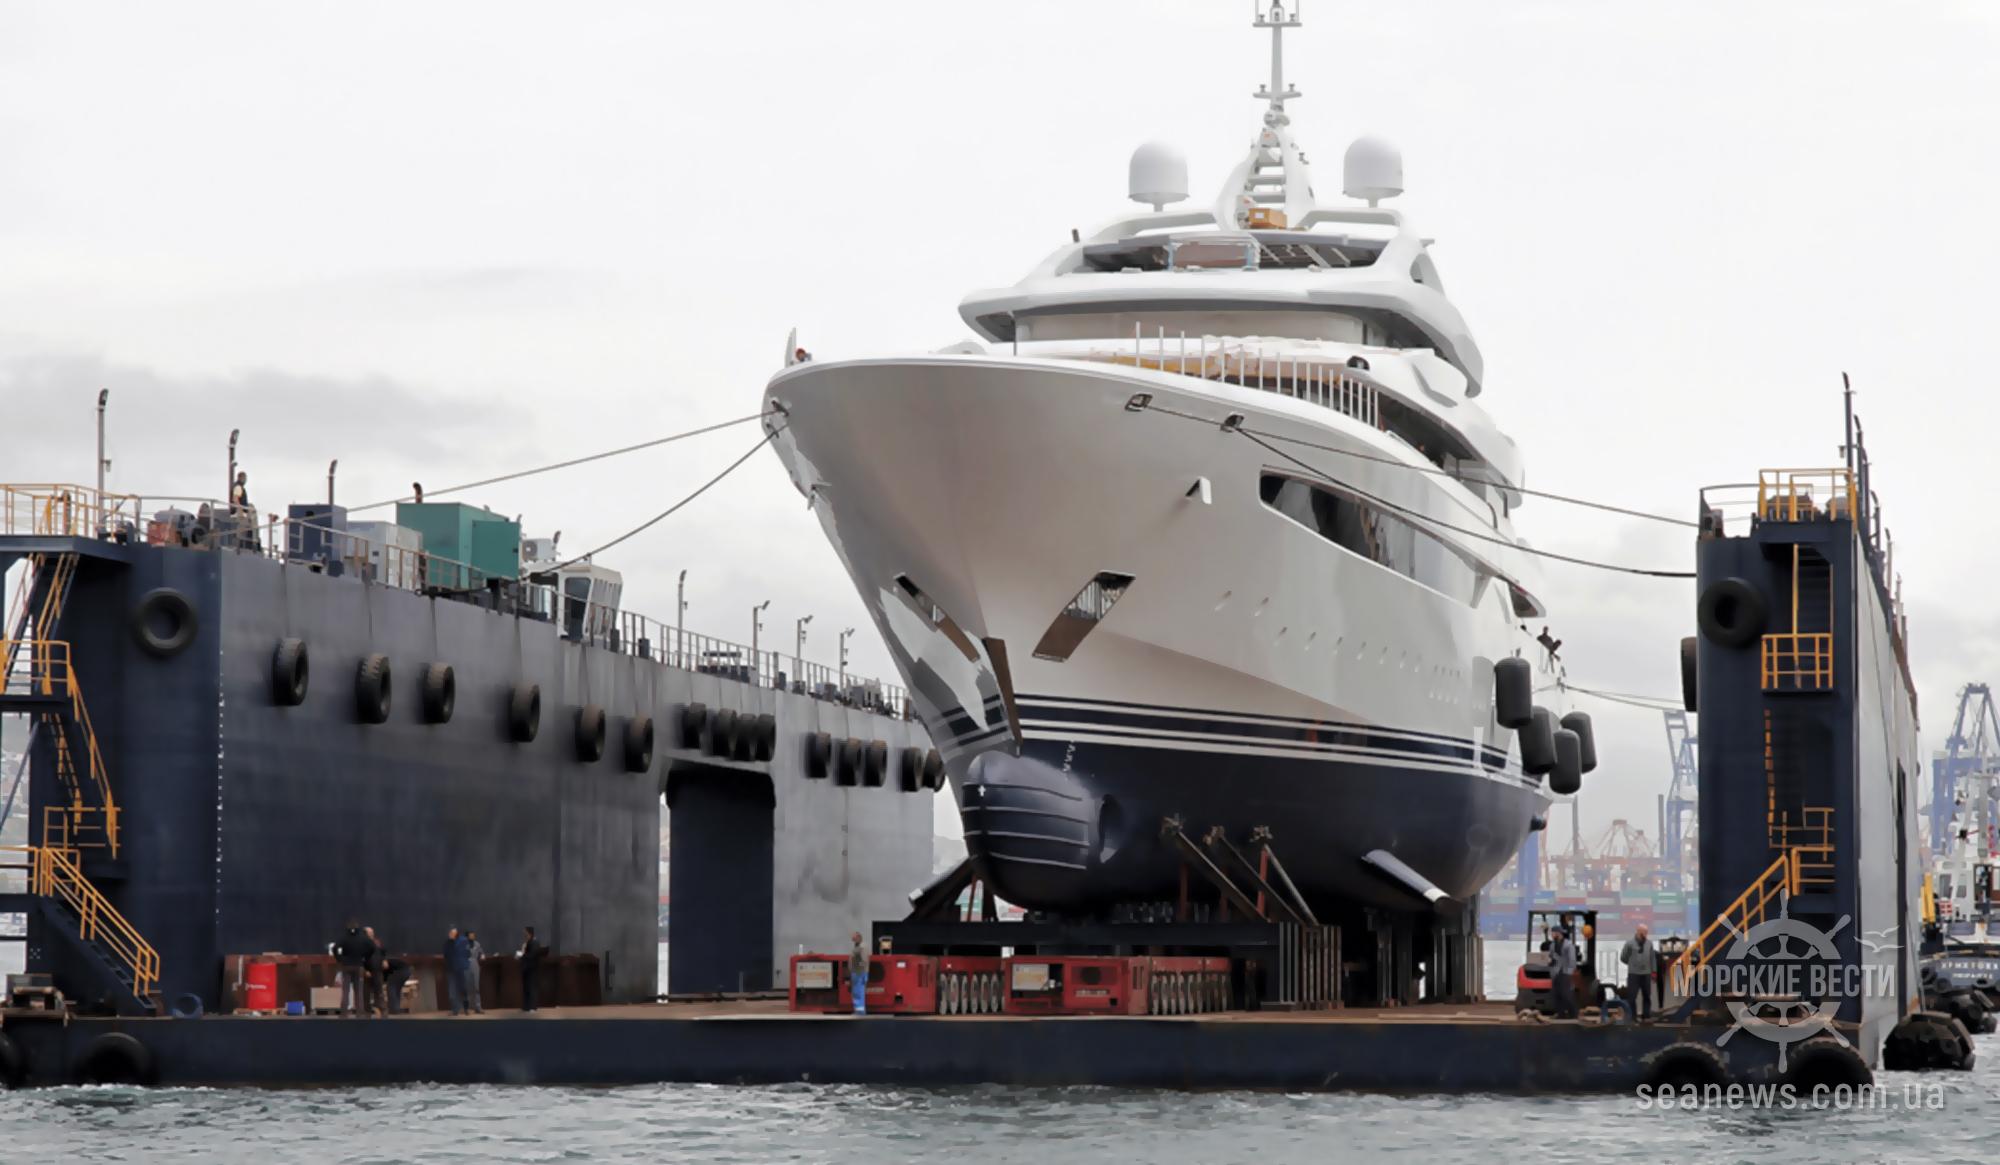 Количество заказов на постройку судов от Греции сократилось